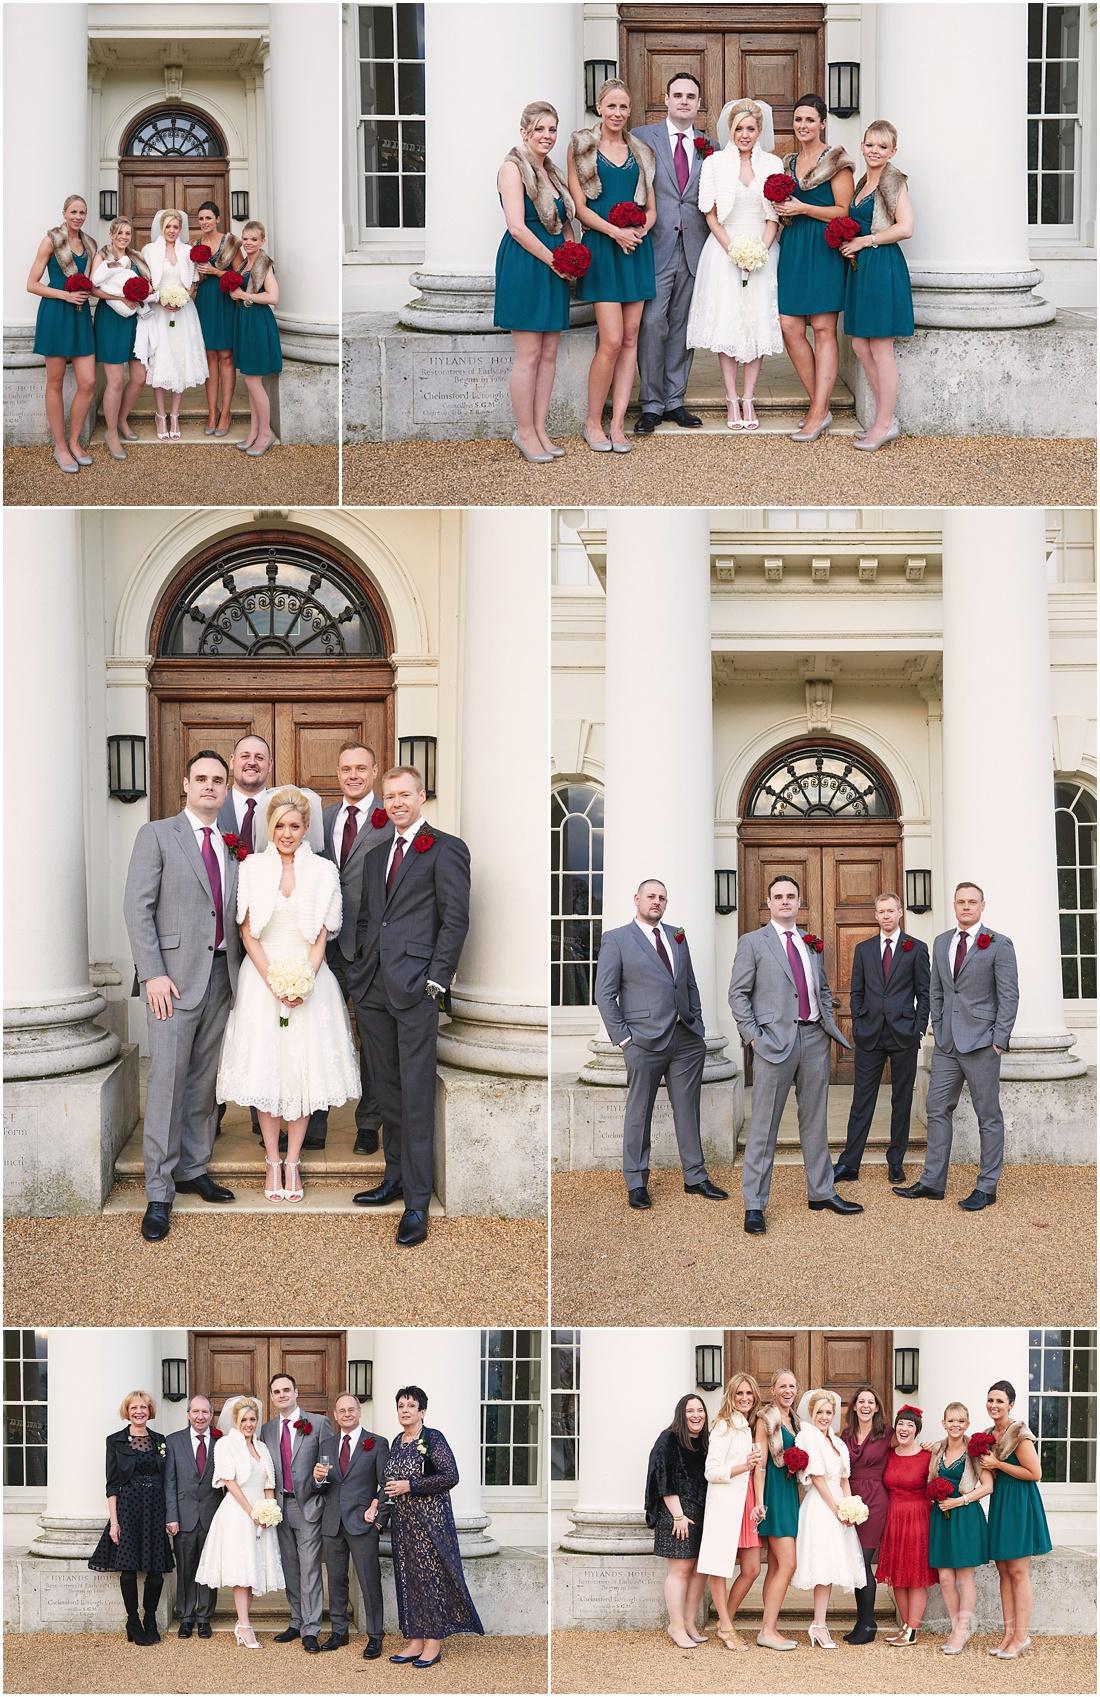 Hylands_House_wedding_photography_e-motion_images_010.JPG